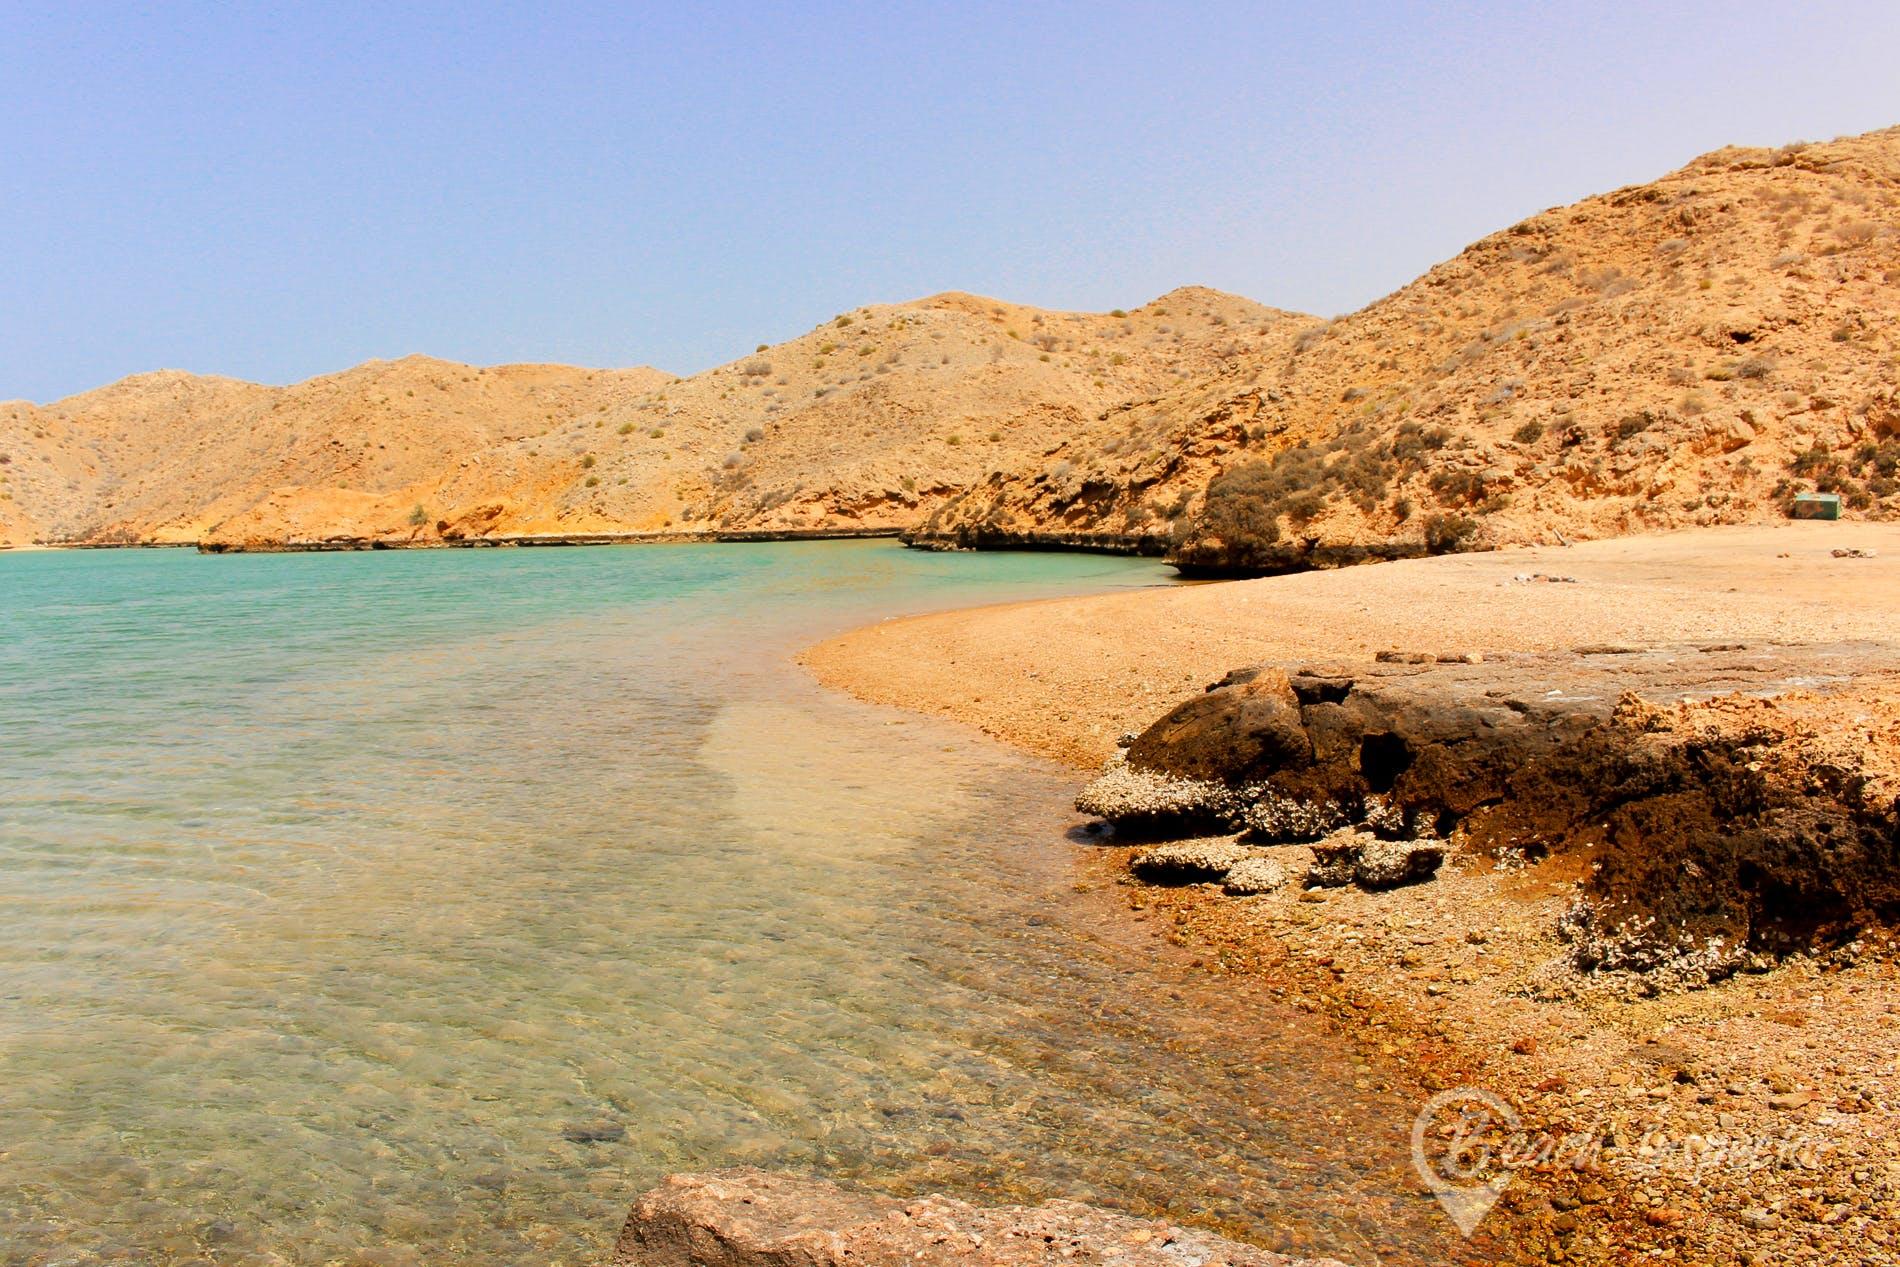 Beach Bandar Khayran, Oman, Oman